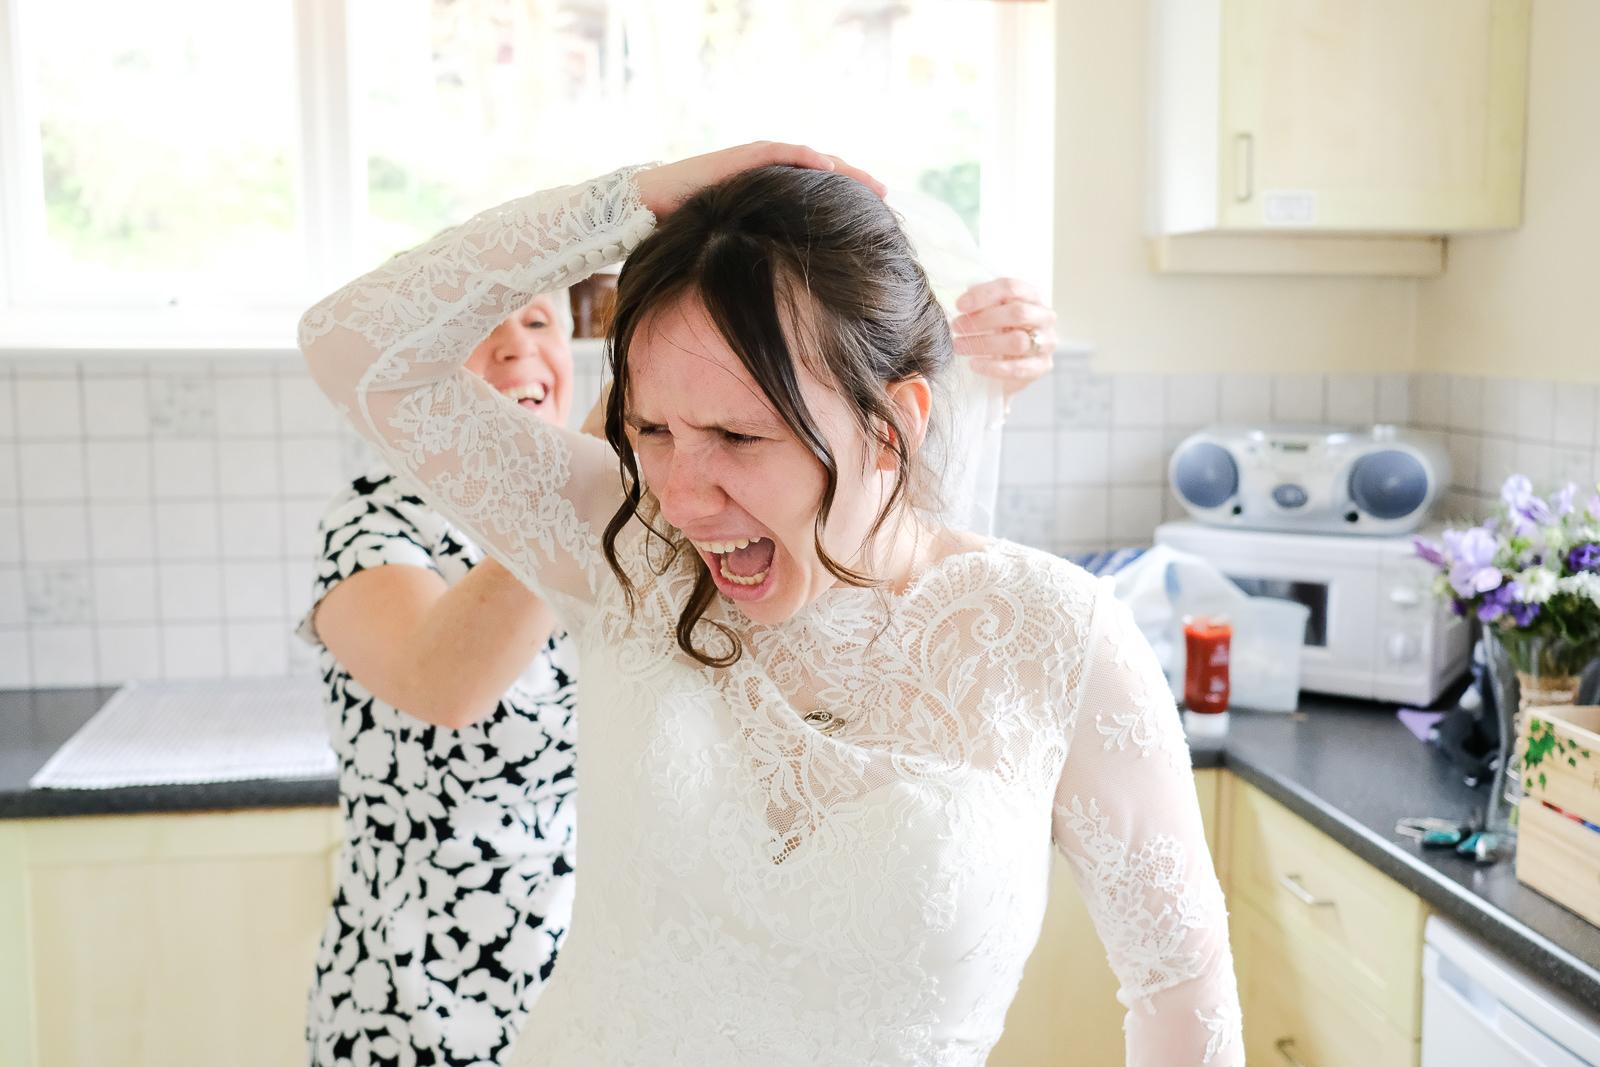 Retorrick Mill Newquay wedding 028.jpg